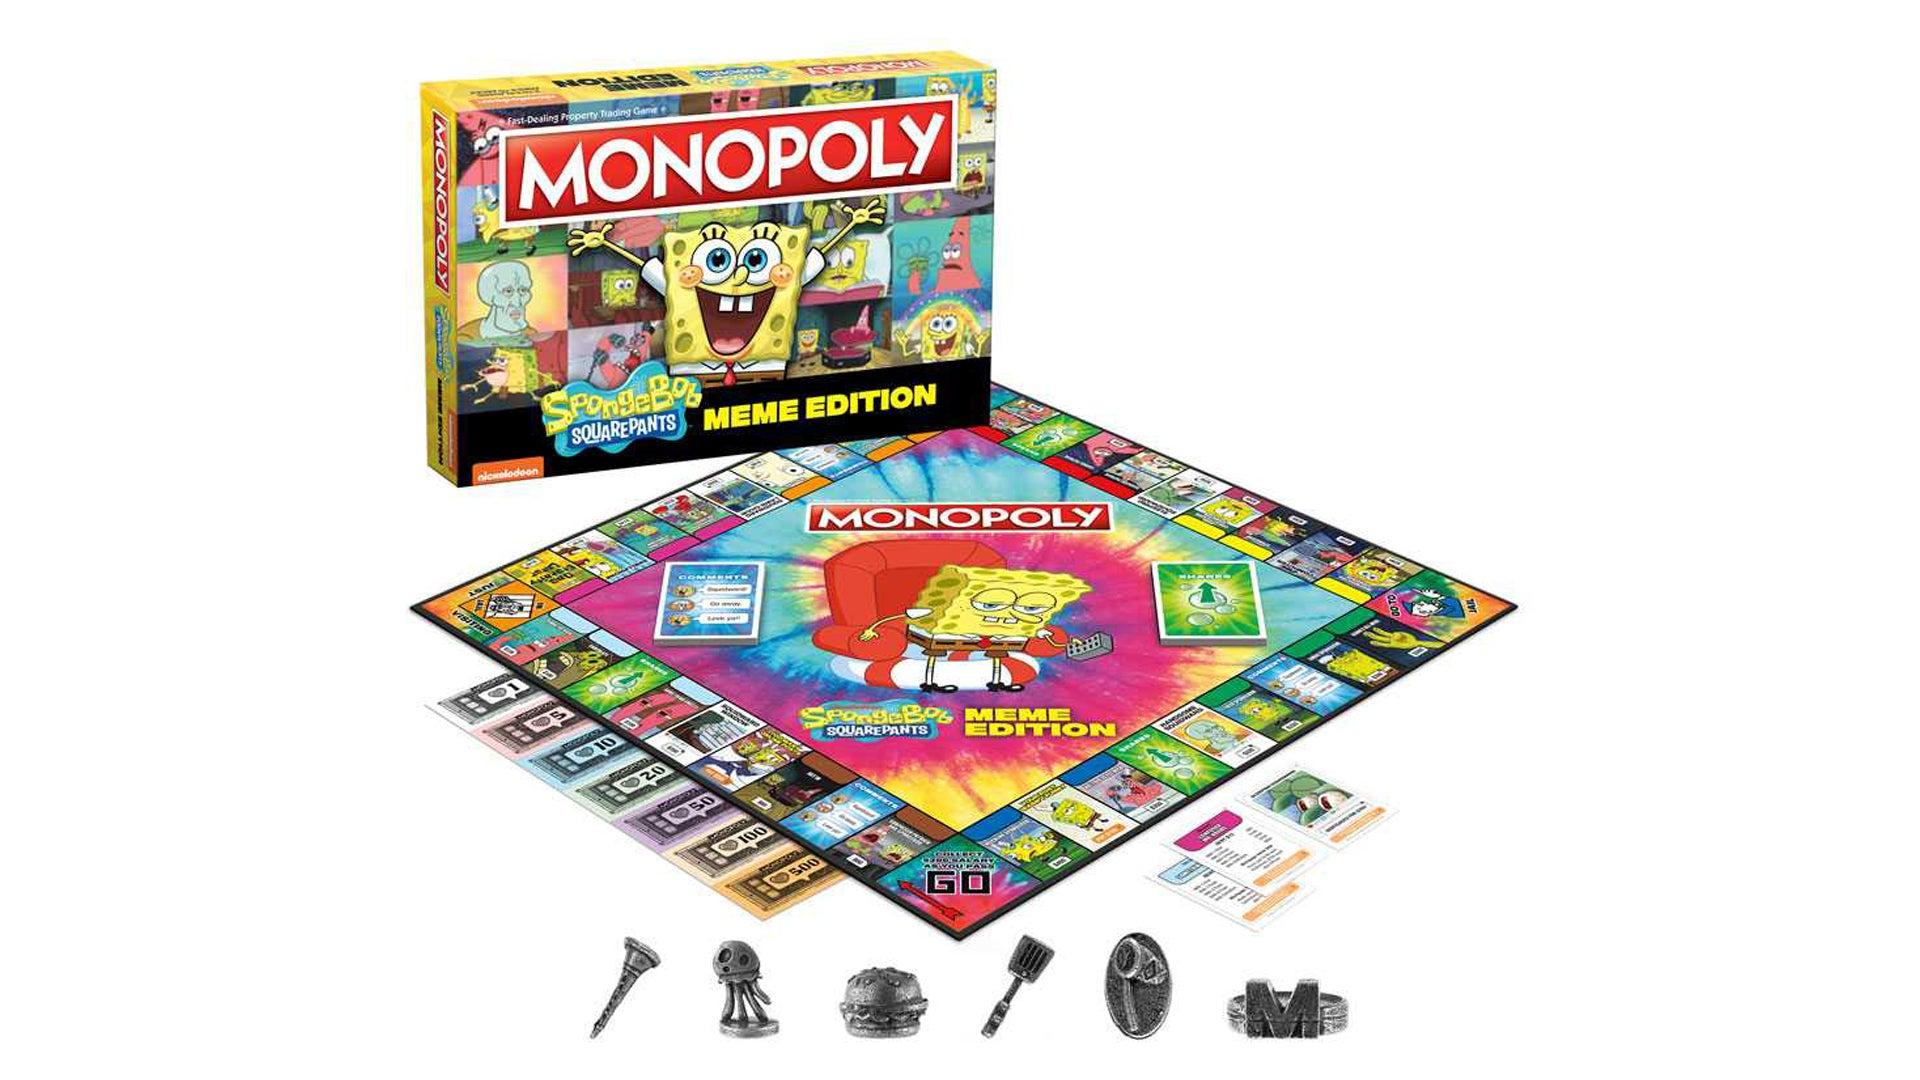 Monopoly: Spongebob Squarepants Meme Edition layout